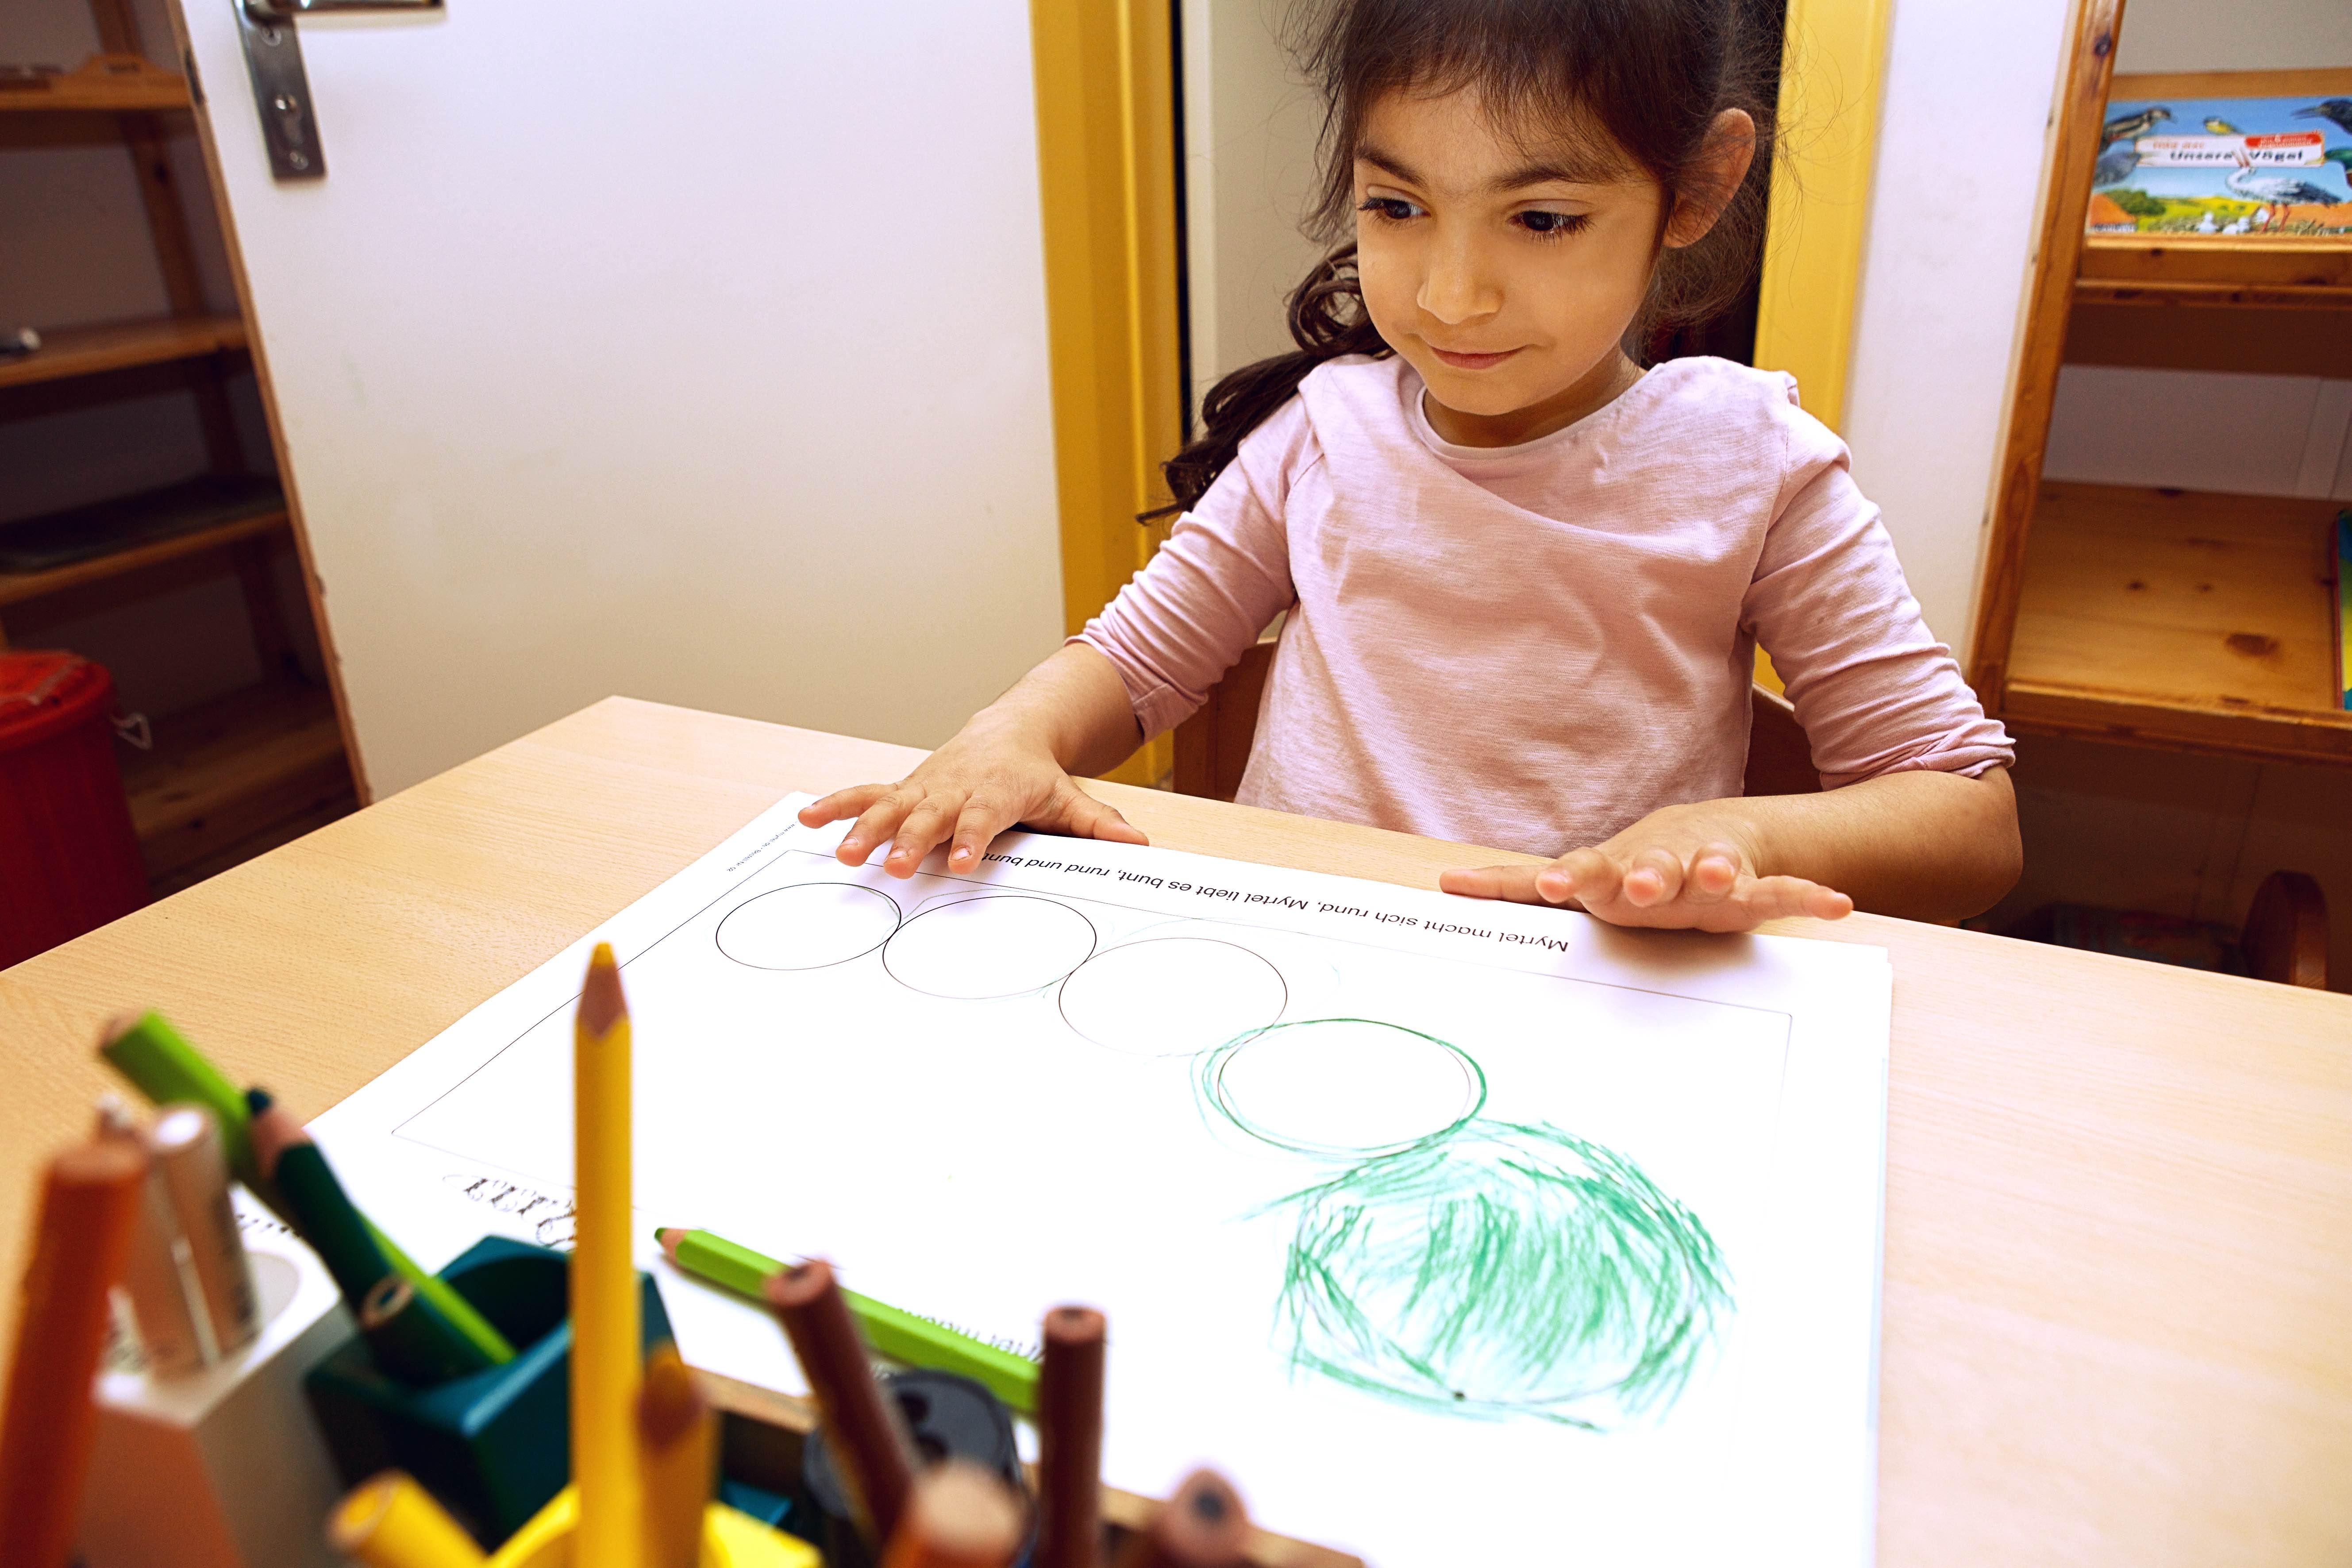 Kindertagesstätte Wurzelkinder Wandsbek Kita Vorschularbeit